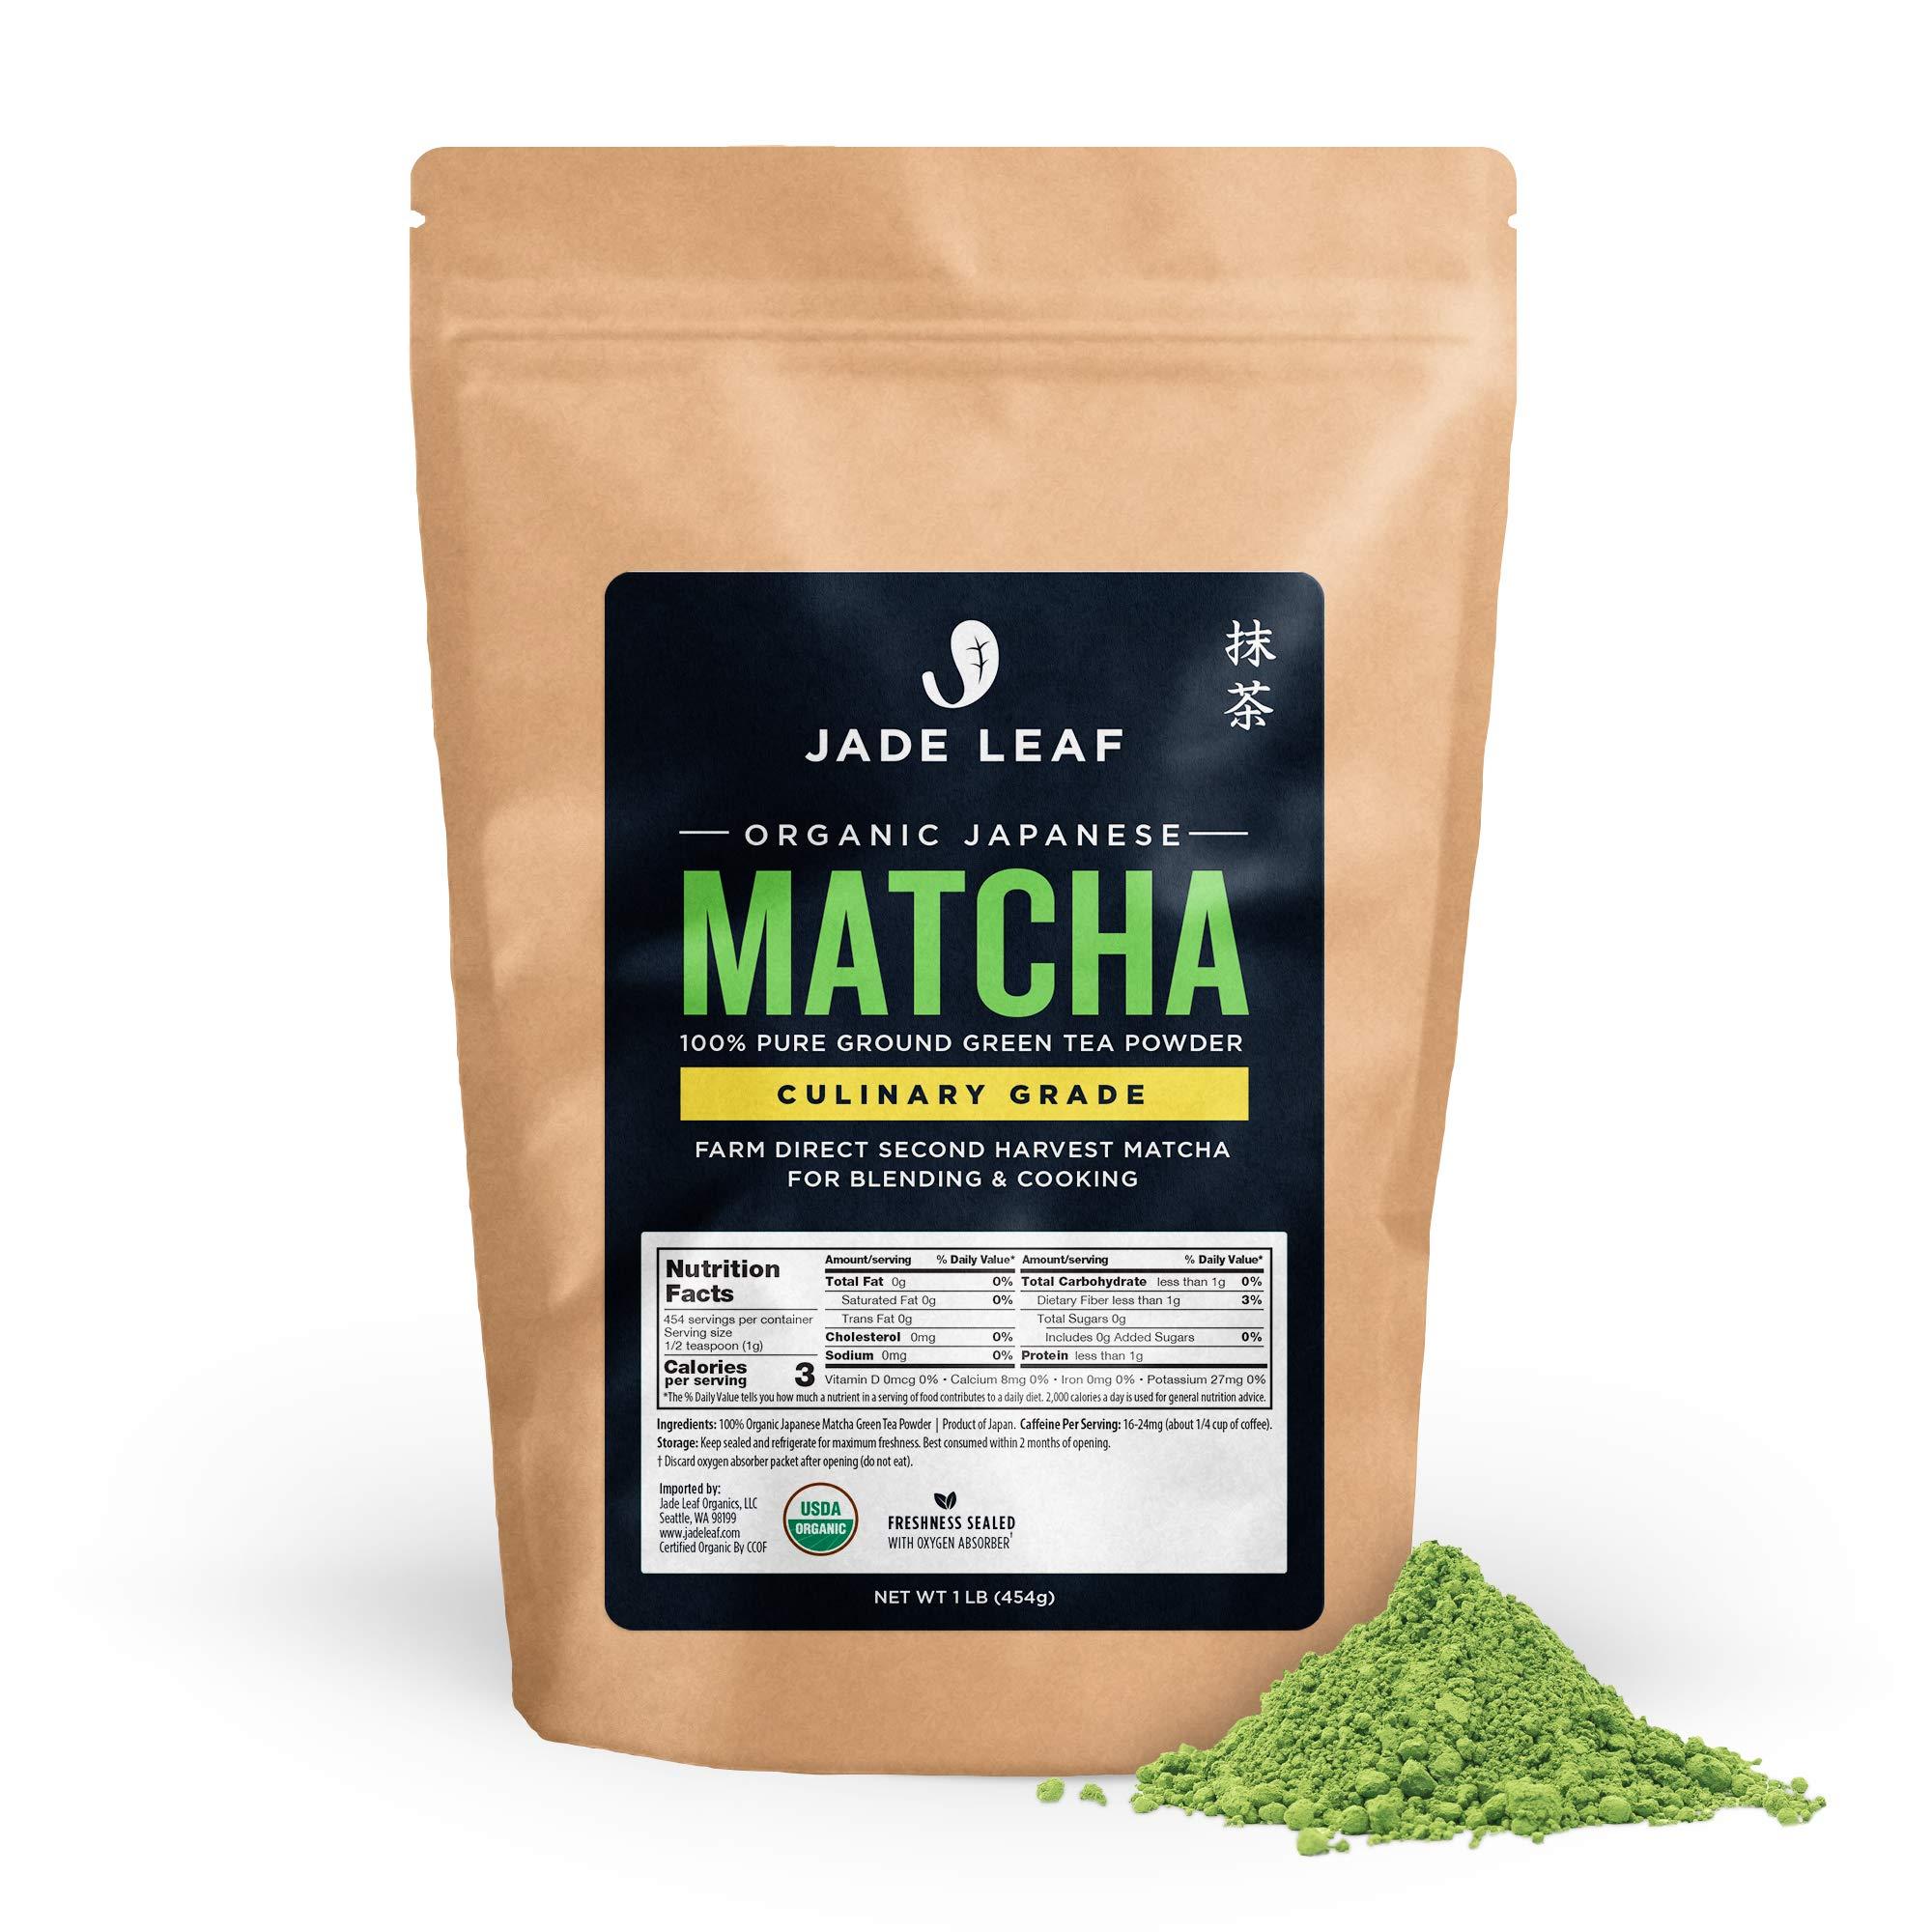 Jade Leaf Matcha Green Tea Powder - Organic, Authentic Japanese Origin - Culinary Grade - Premium 2nd Harvest [16oz]